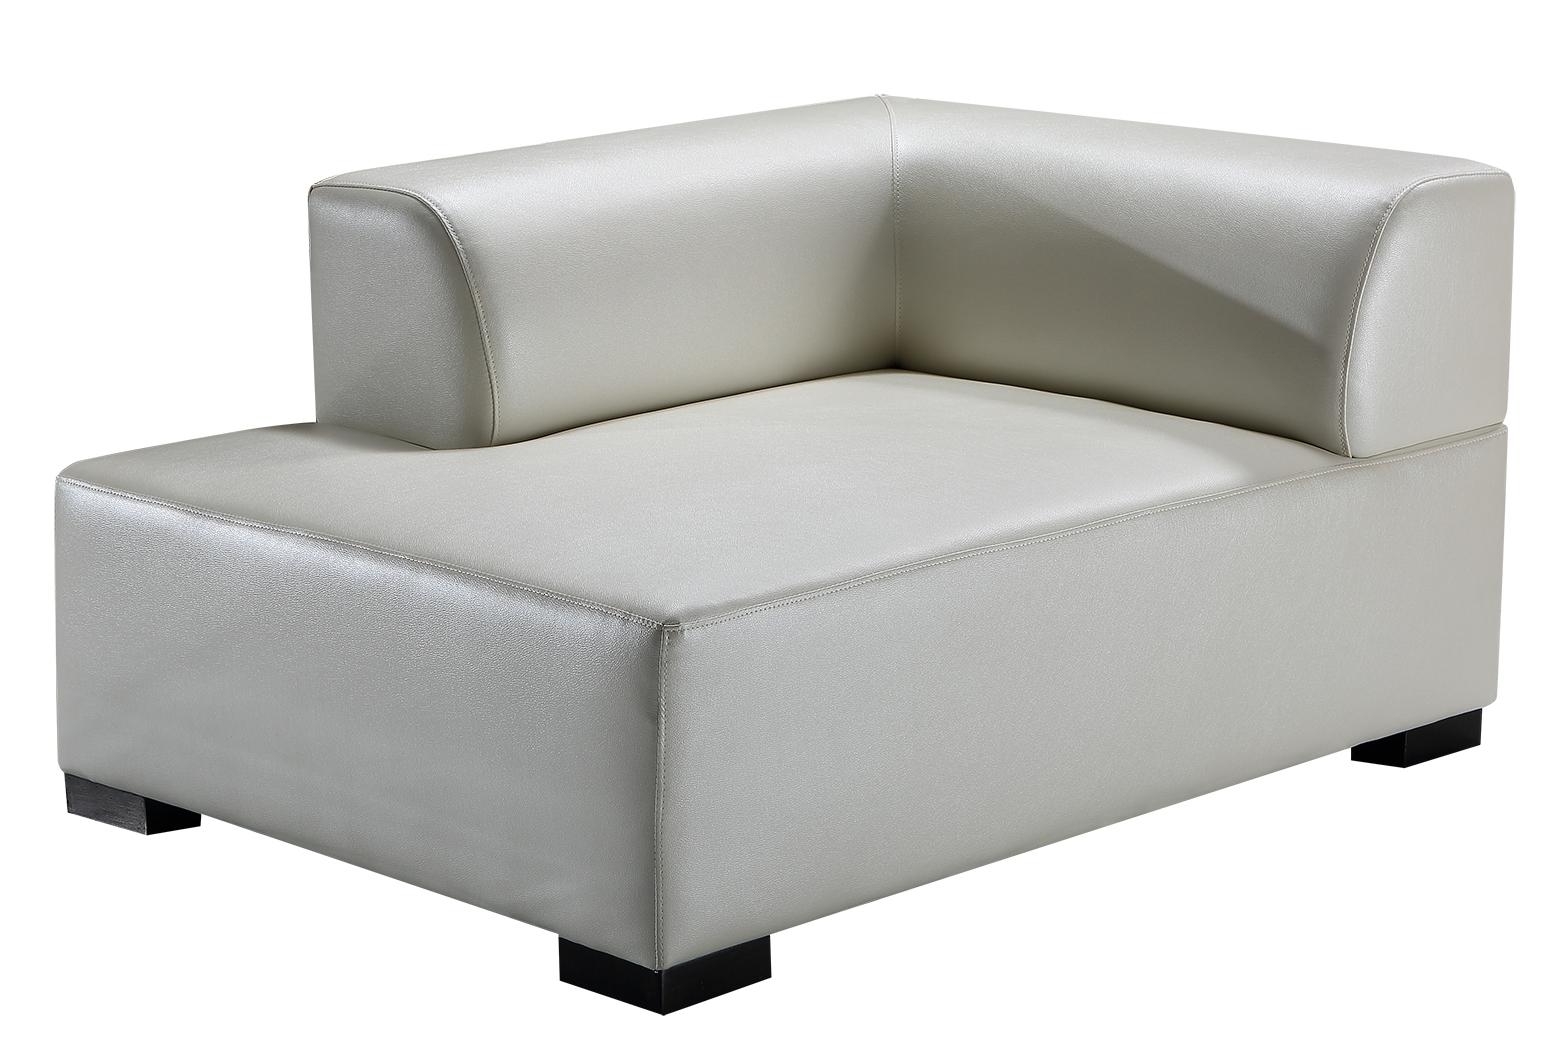 Neu hotel komfortables ecksofa couch leder beige sofa for Ecksofa beige leder